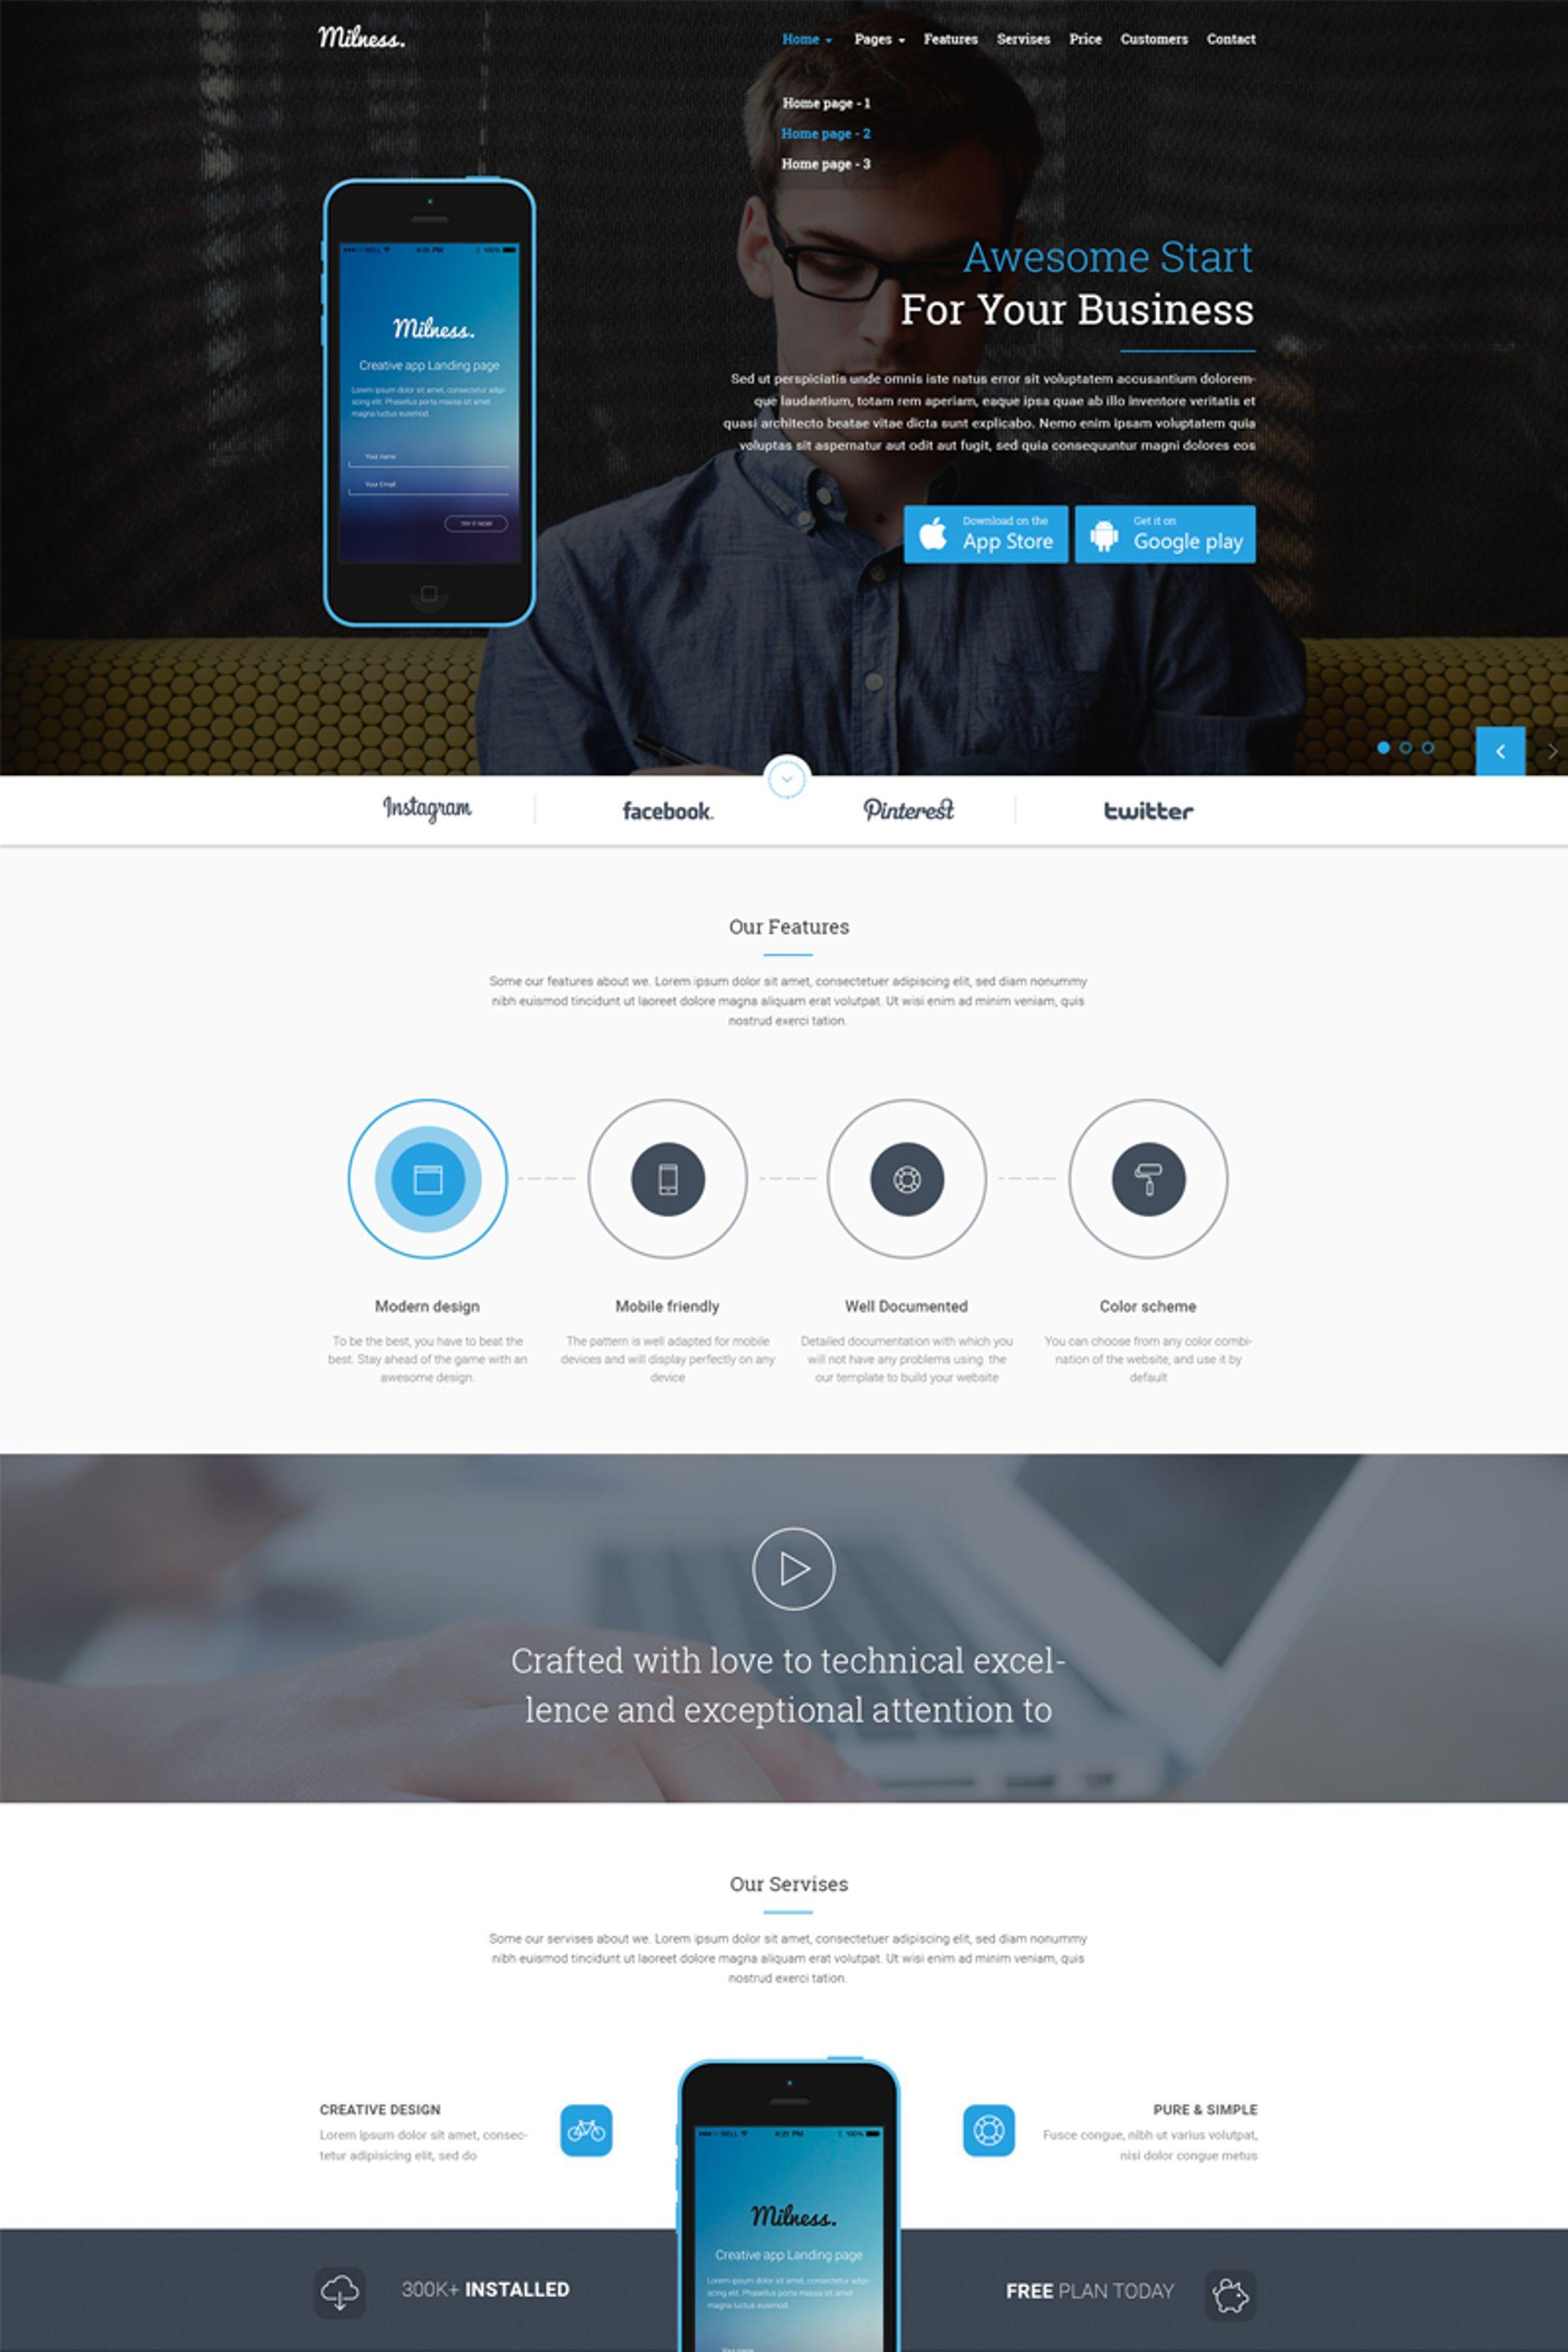 Milness - Showcase Mobile App Template Web №65448